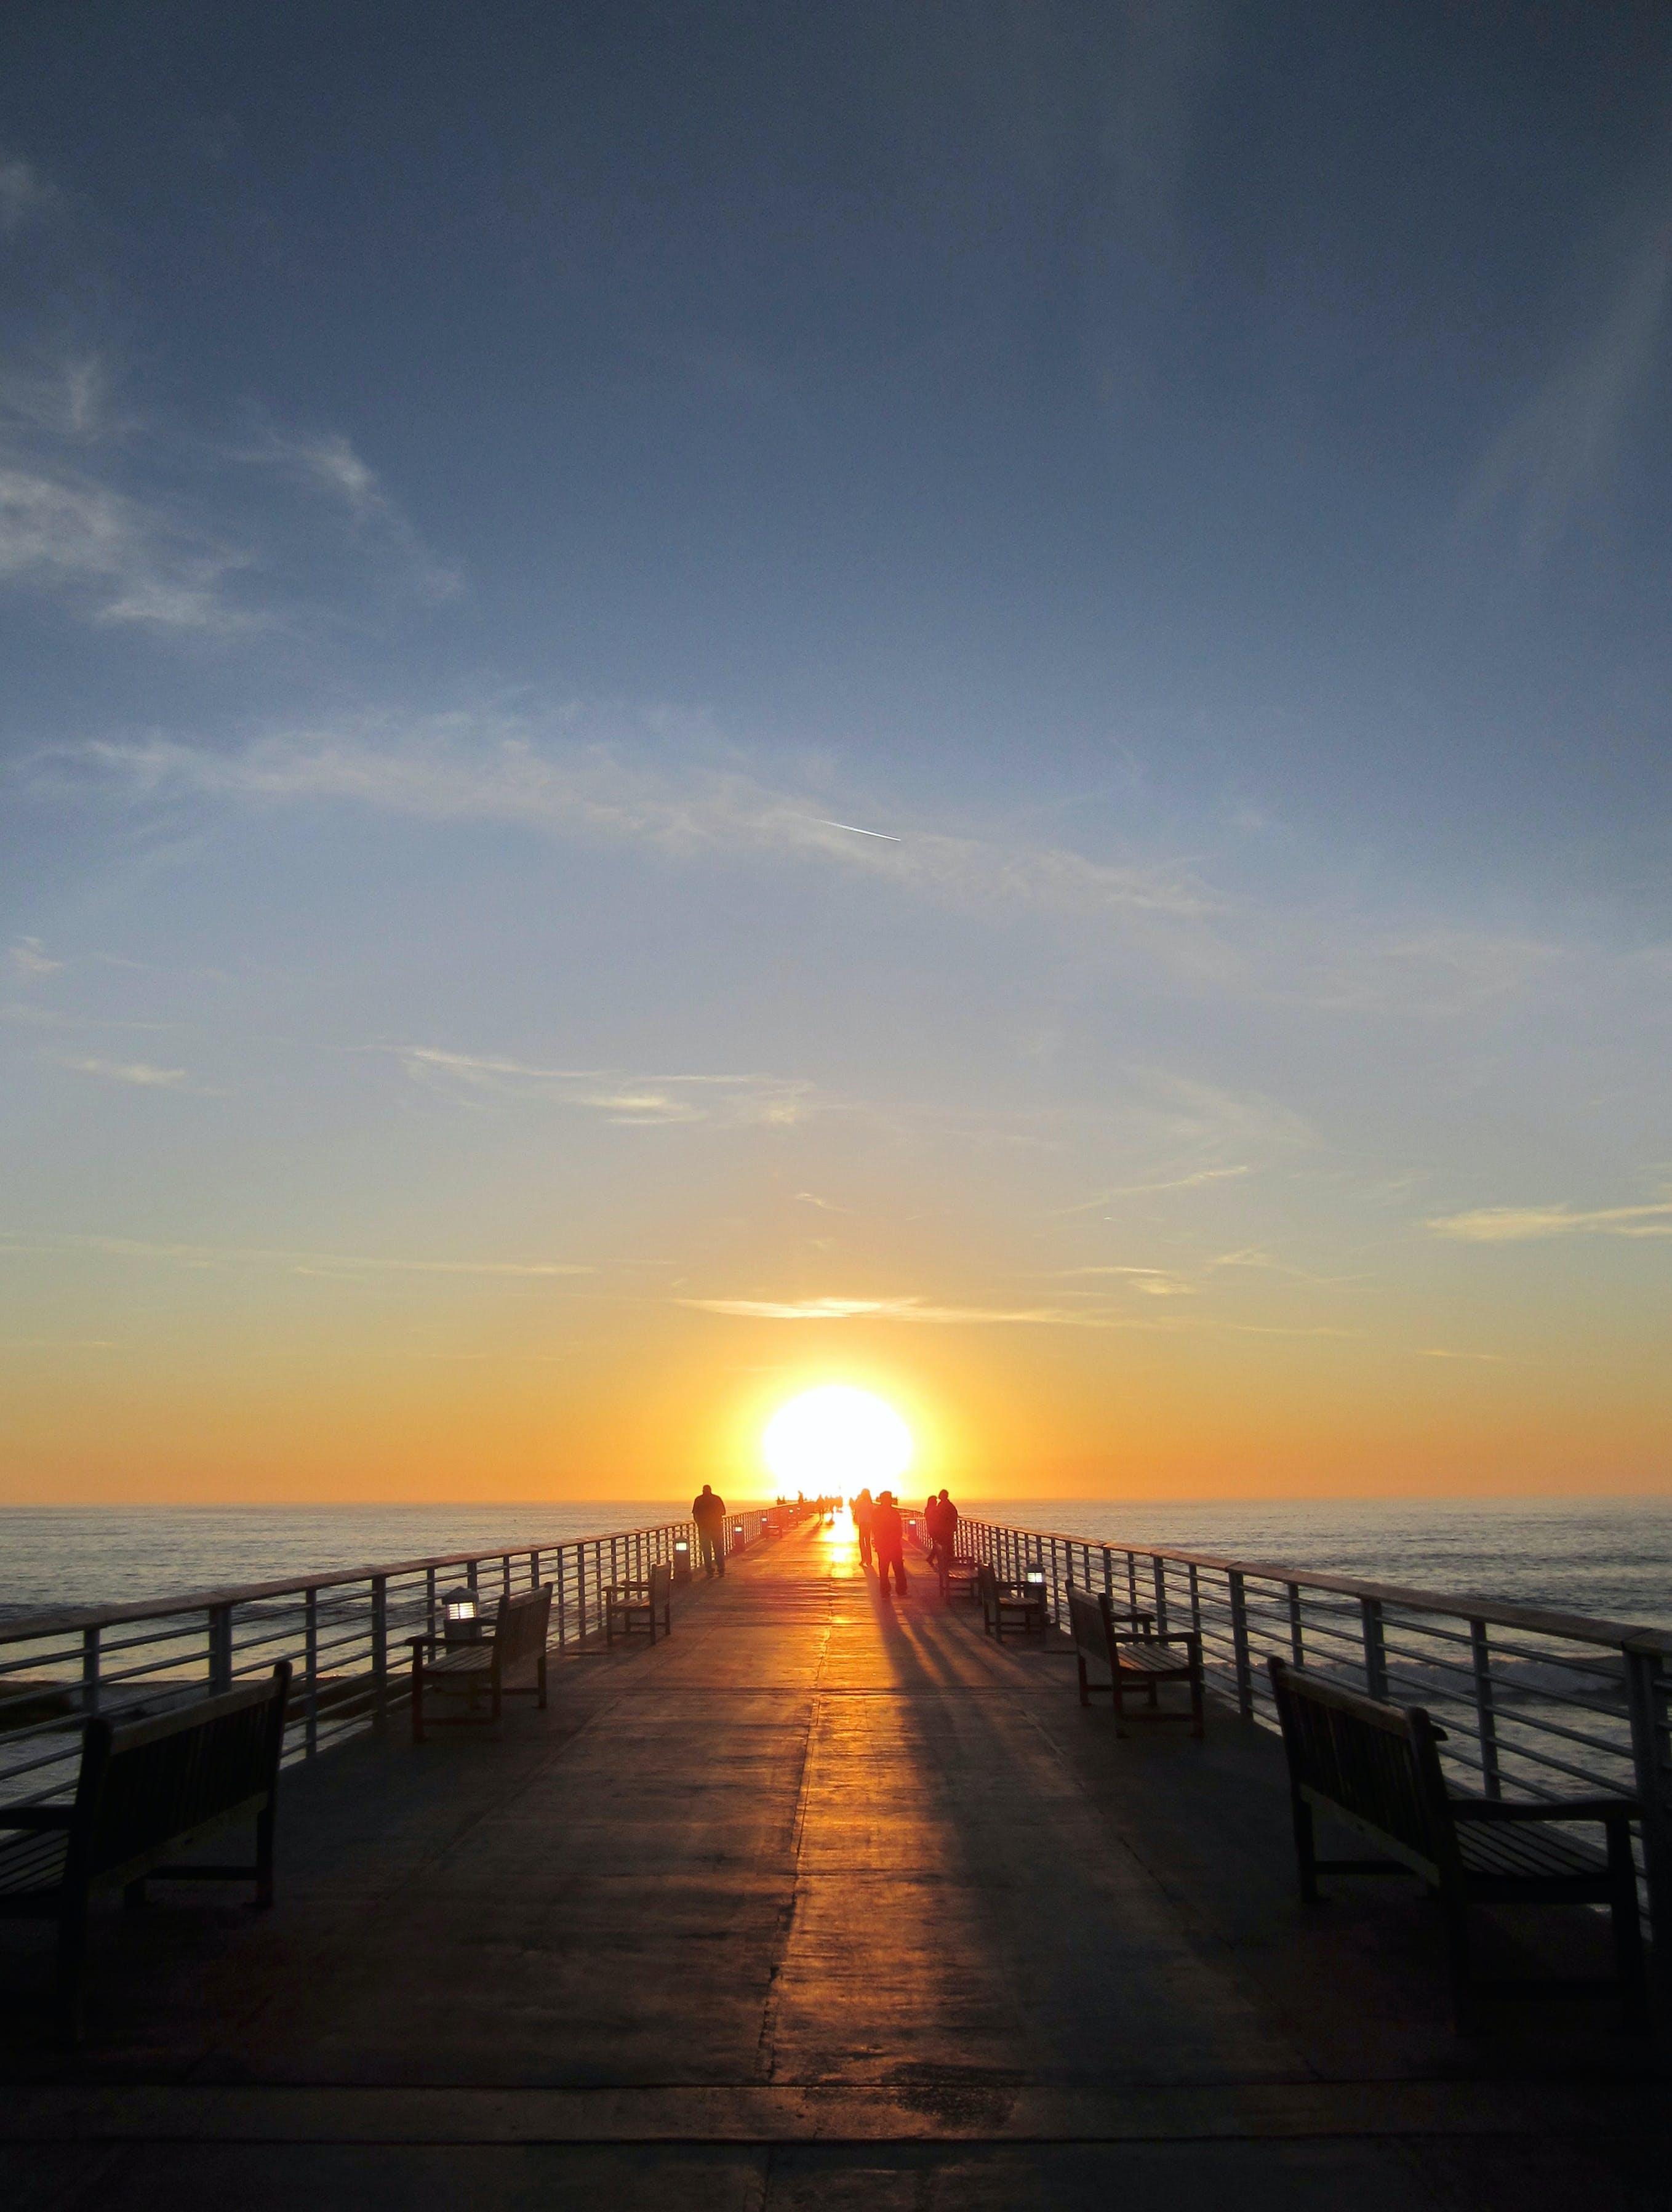 dawn, dusk, jetty